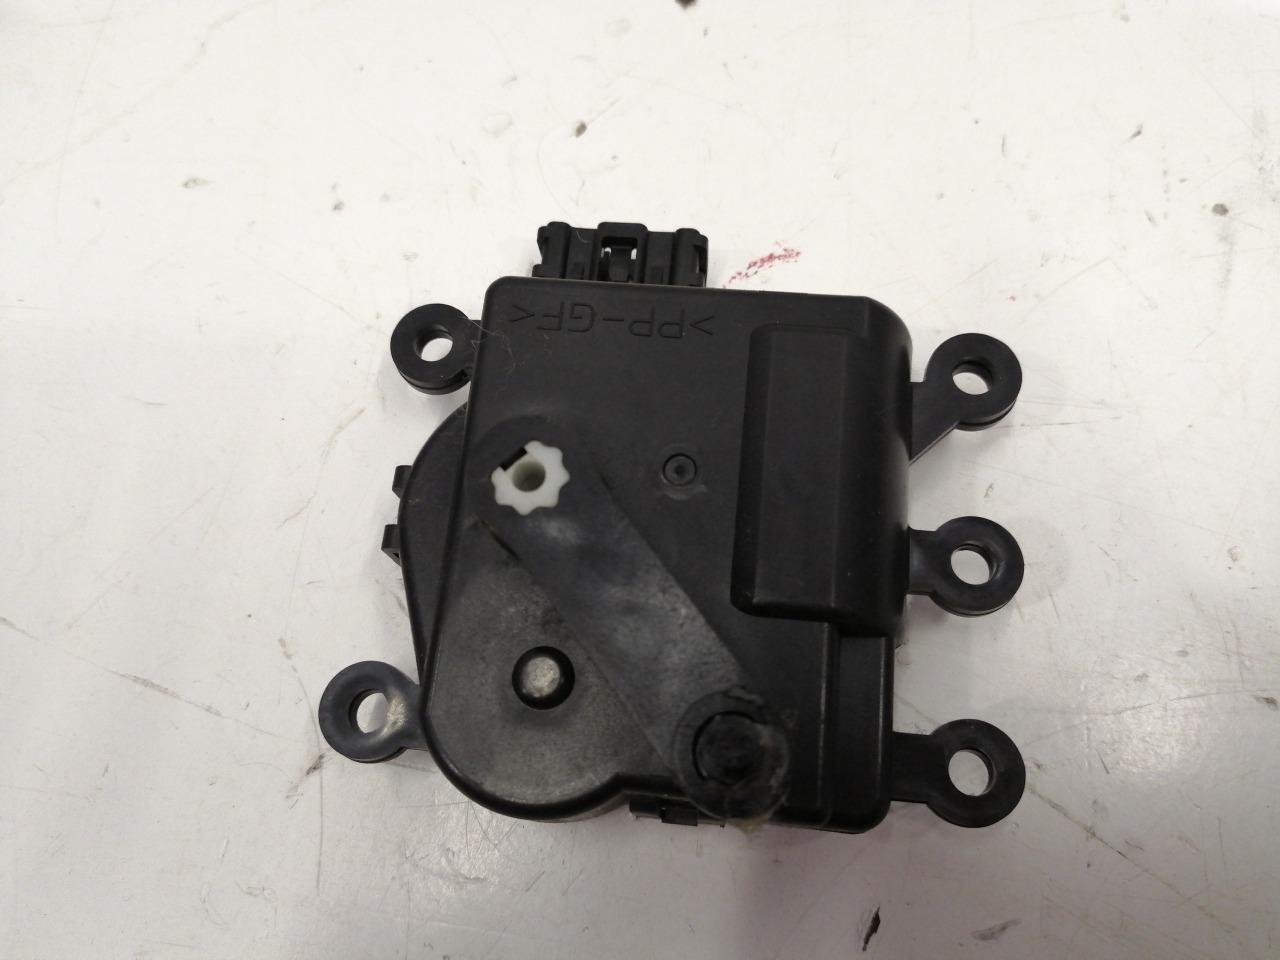 Мотор привода заслонки рециркуляции Mazda Mazda6 GH 2008